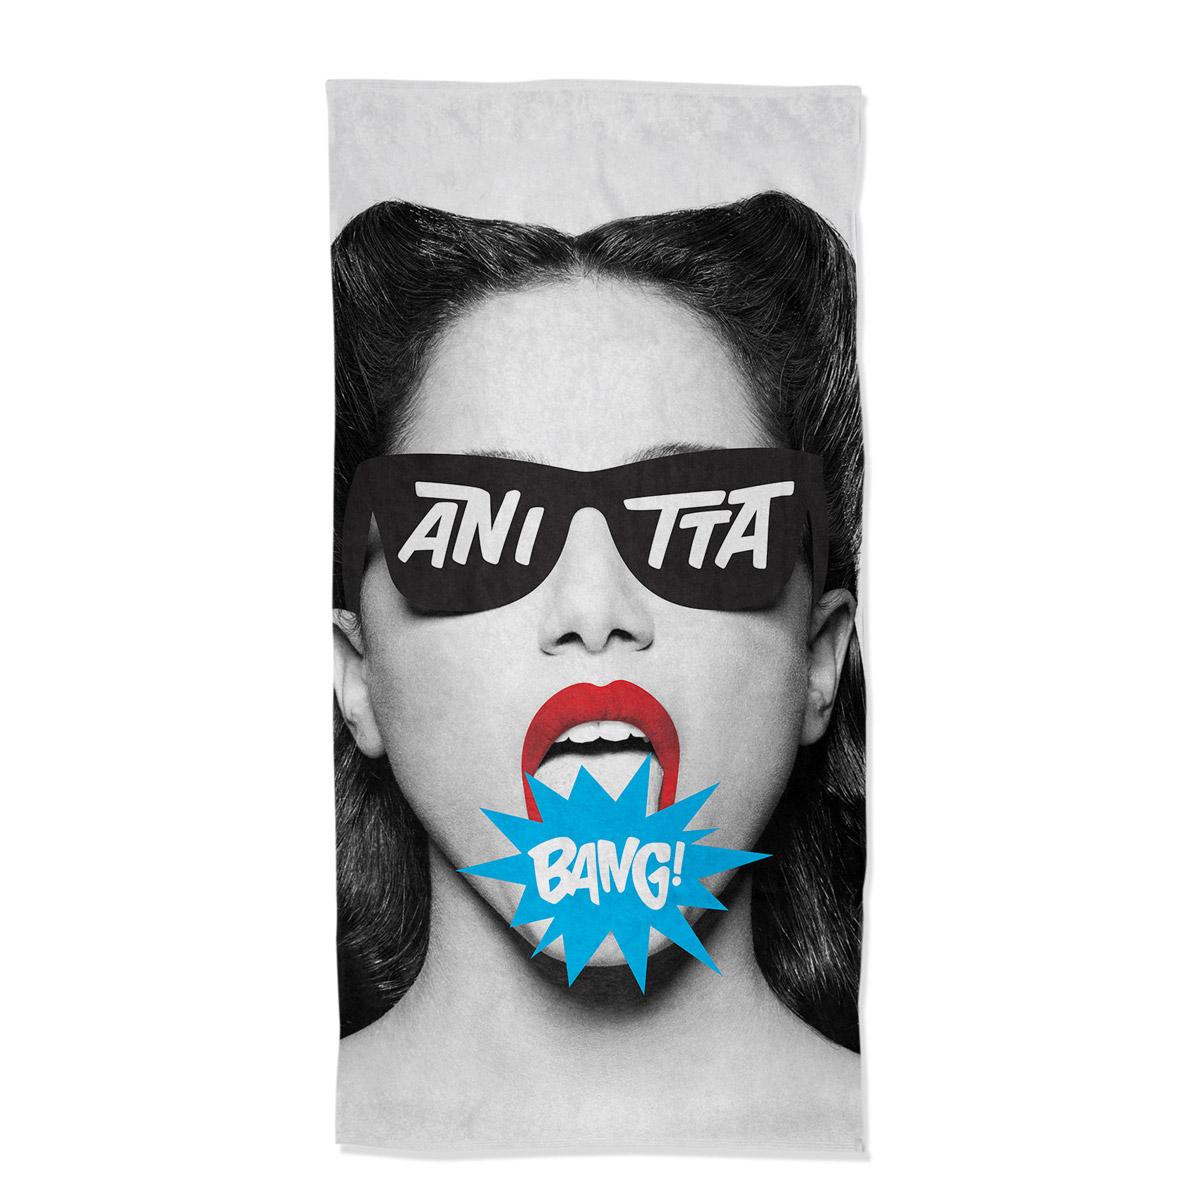 Toalha de Banho Anitta Bang!